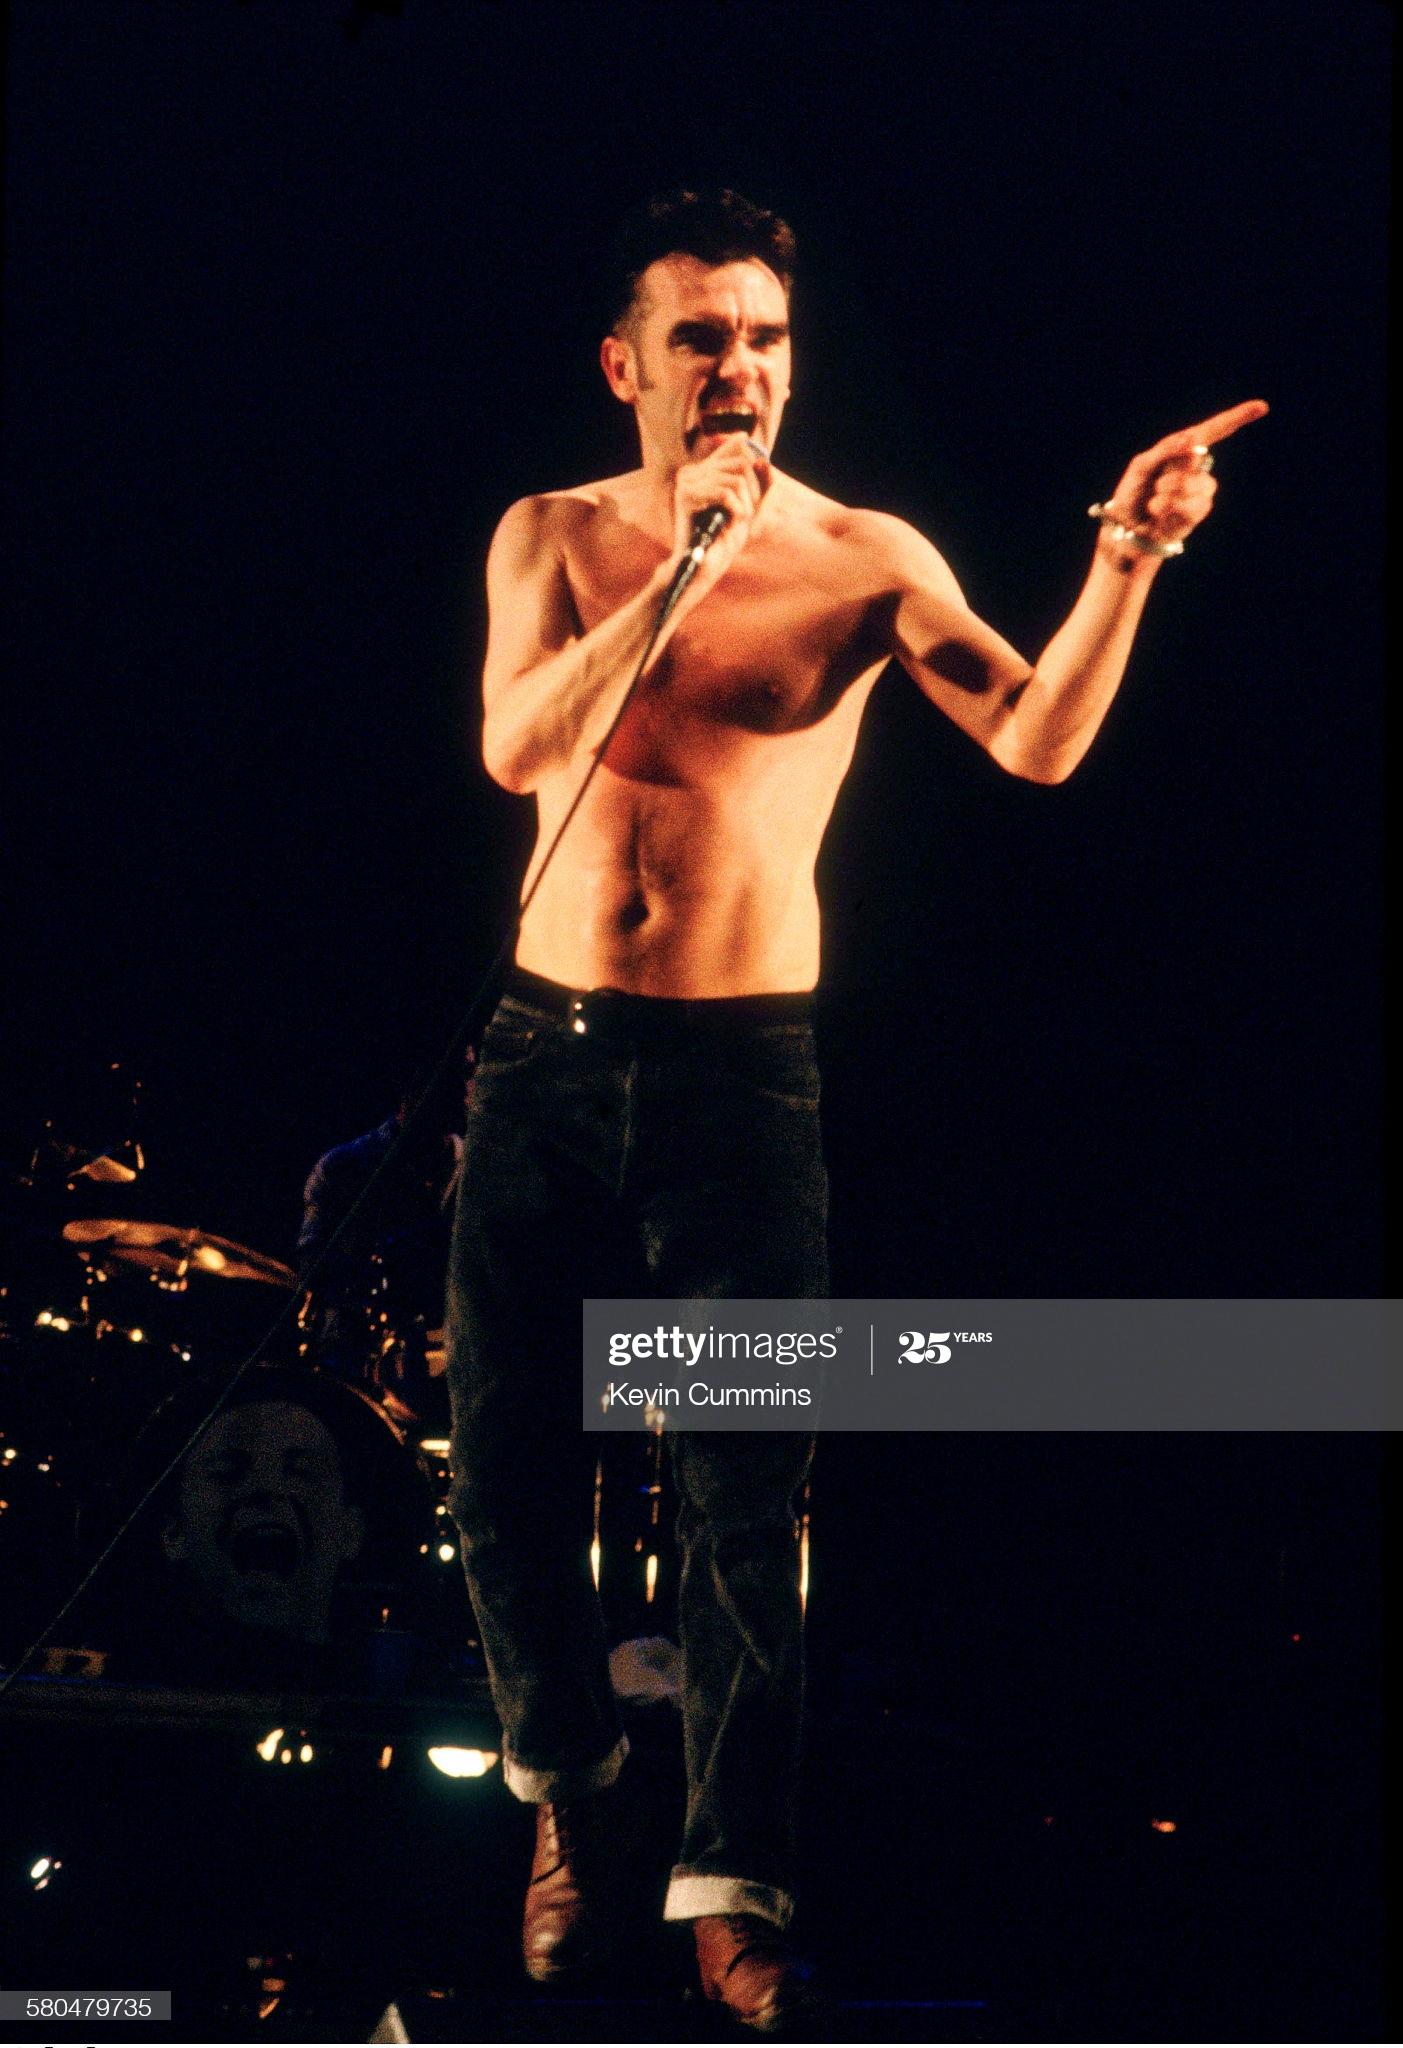 Morrissey ~ Japan September 5th 1991 (iii) Kevin Cummins.jpg